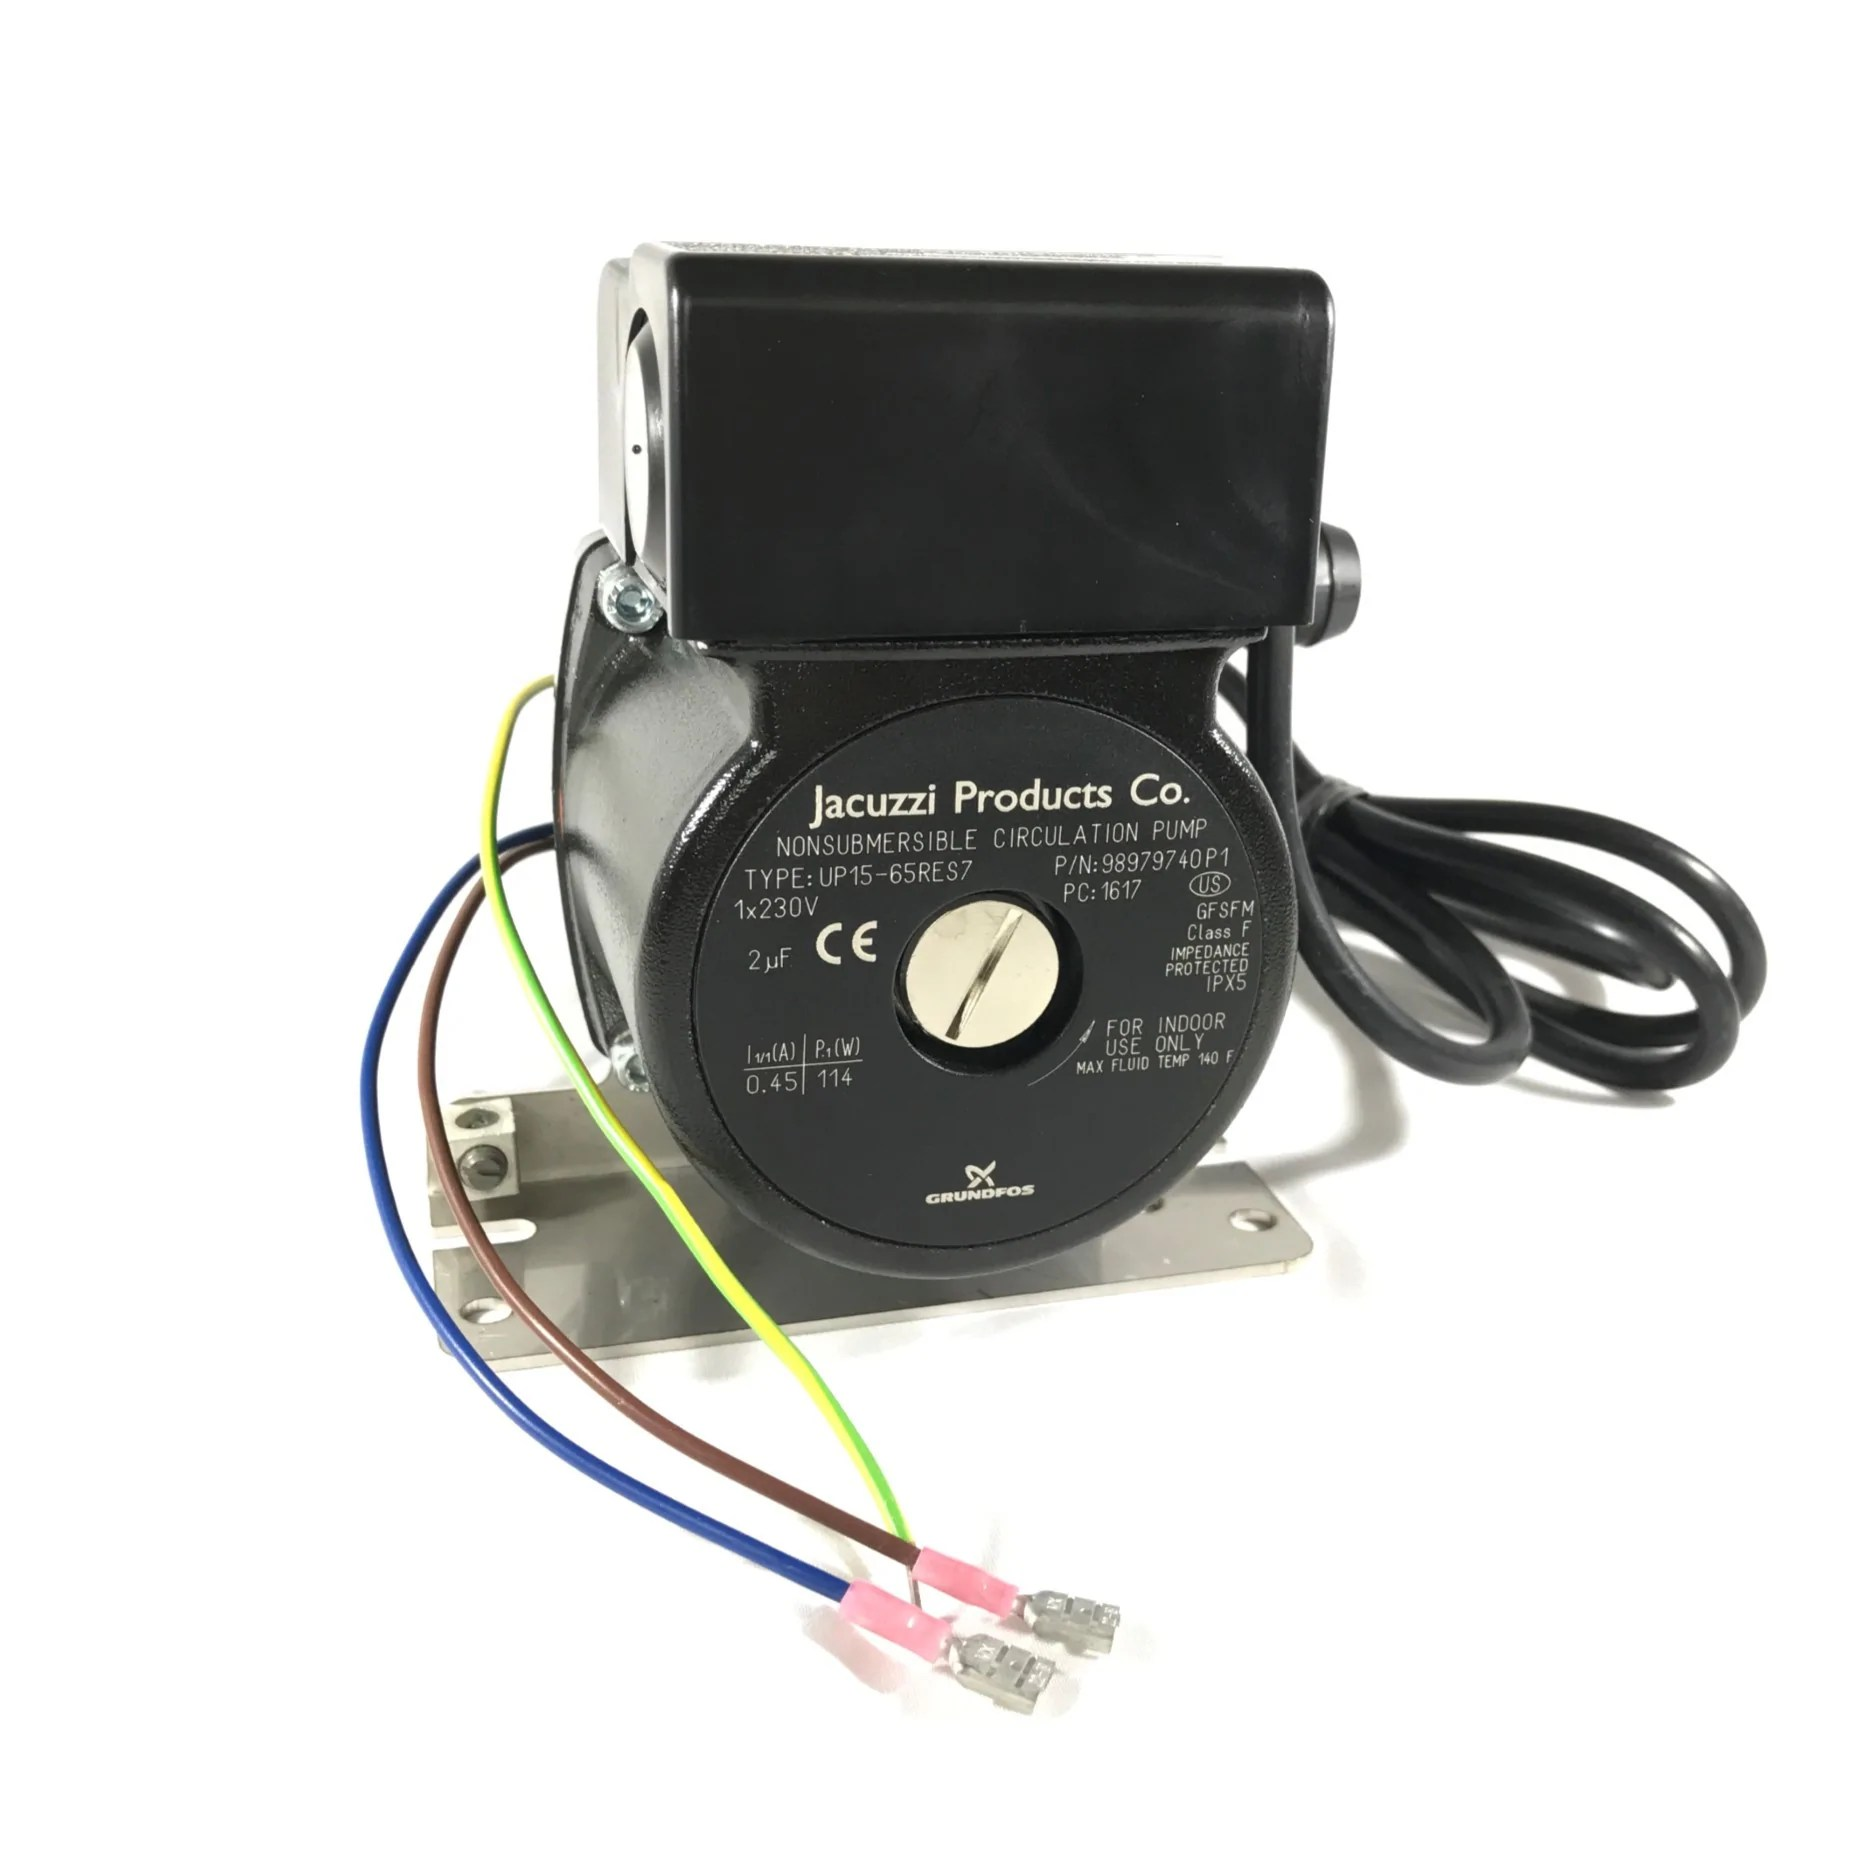 medium resolution of jacuzzi hot tub circulation pump 240vac 50hz part no 6000 125